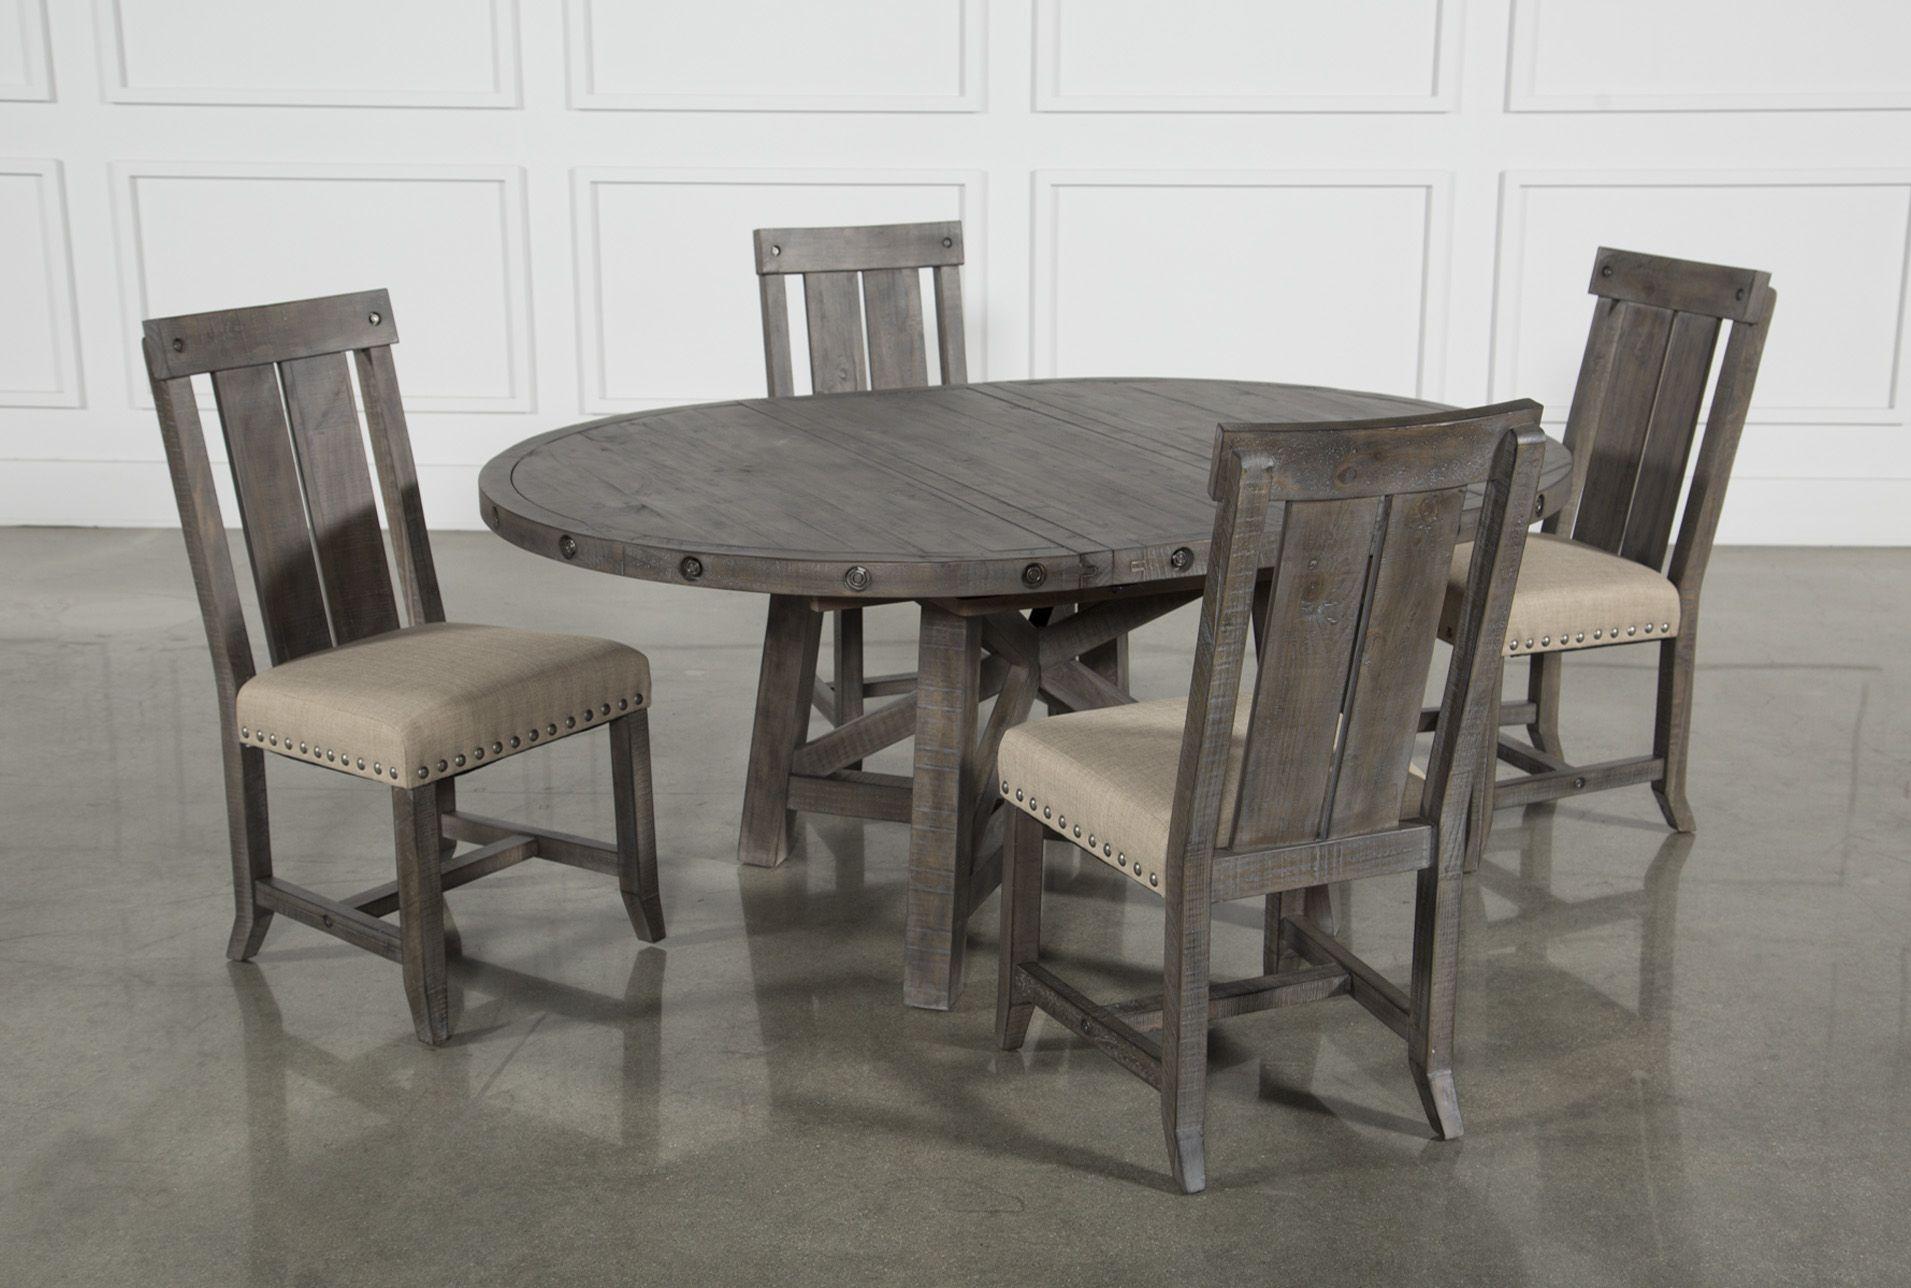 f9eabd0a34 Jaxon Grey 5 Piece Round Extension Dining Set W/Wood Chairs ...